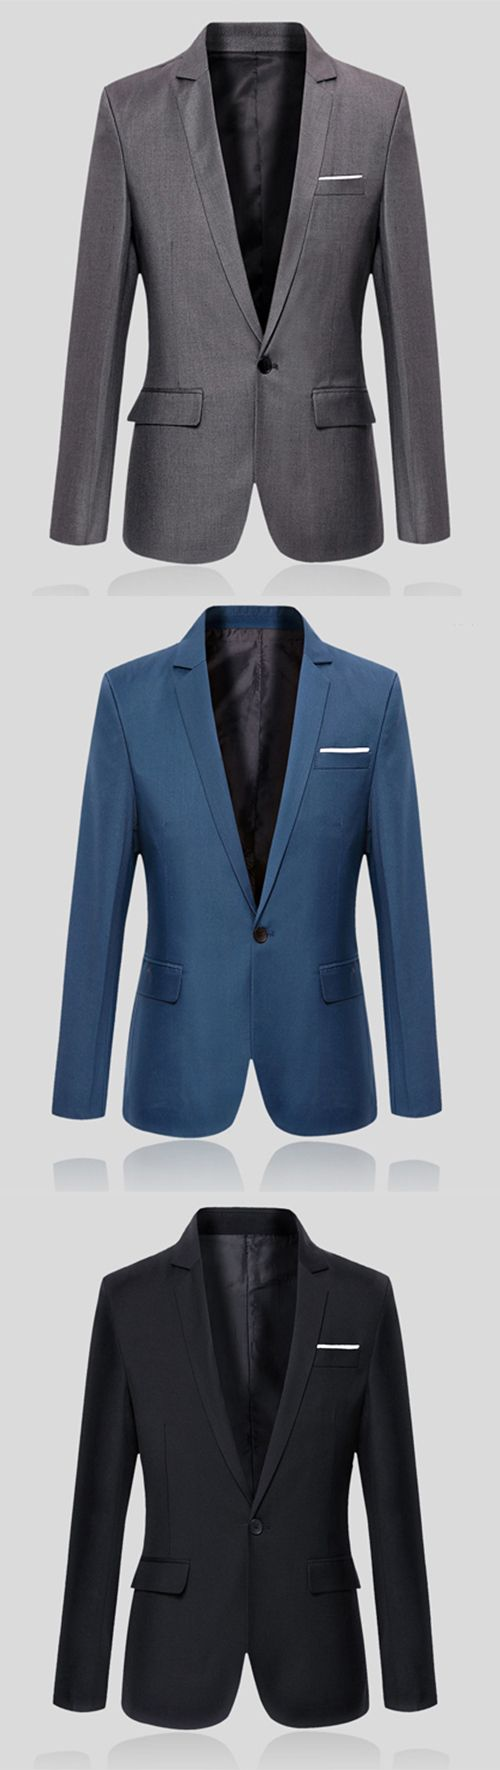 Men's Work Simple Spring Fall Blazer,Solid Long Sleeve Regular Cotton Blazer